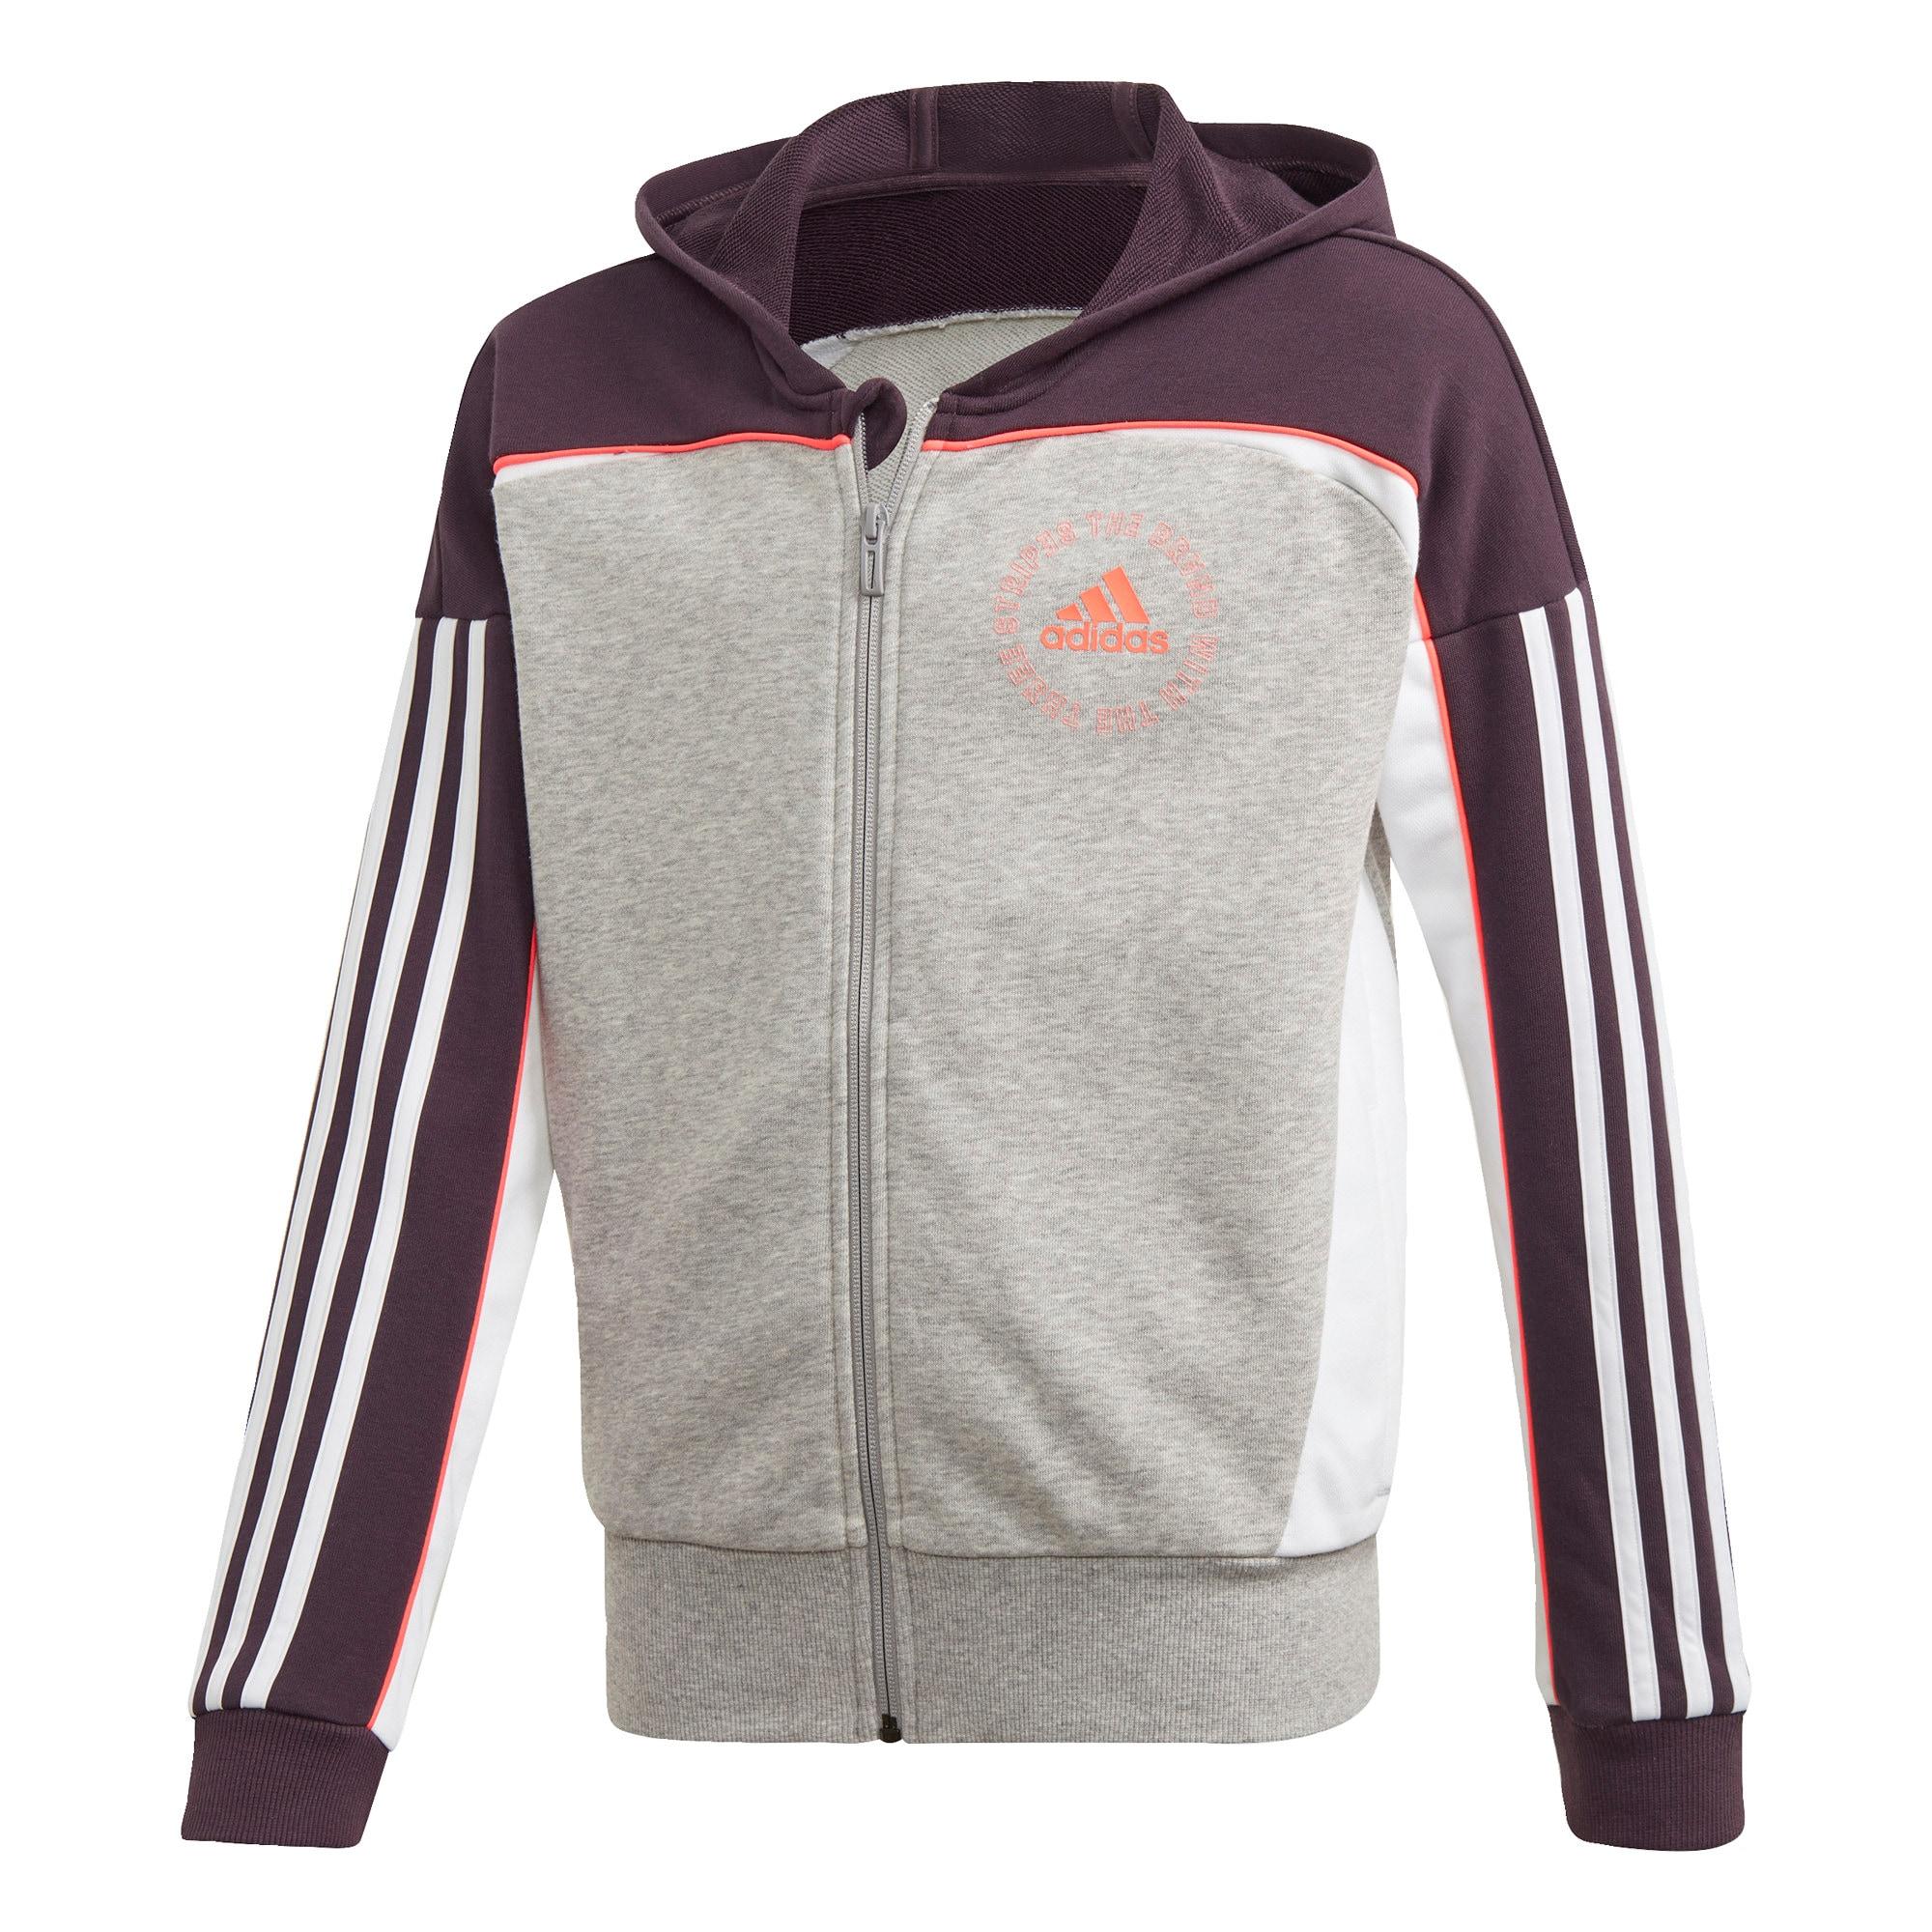 ADIDAS PERFORMANCE Sportovní bunda  bílá / oranžová / šedá / černá